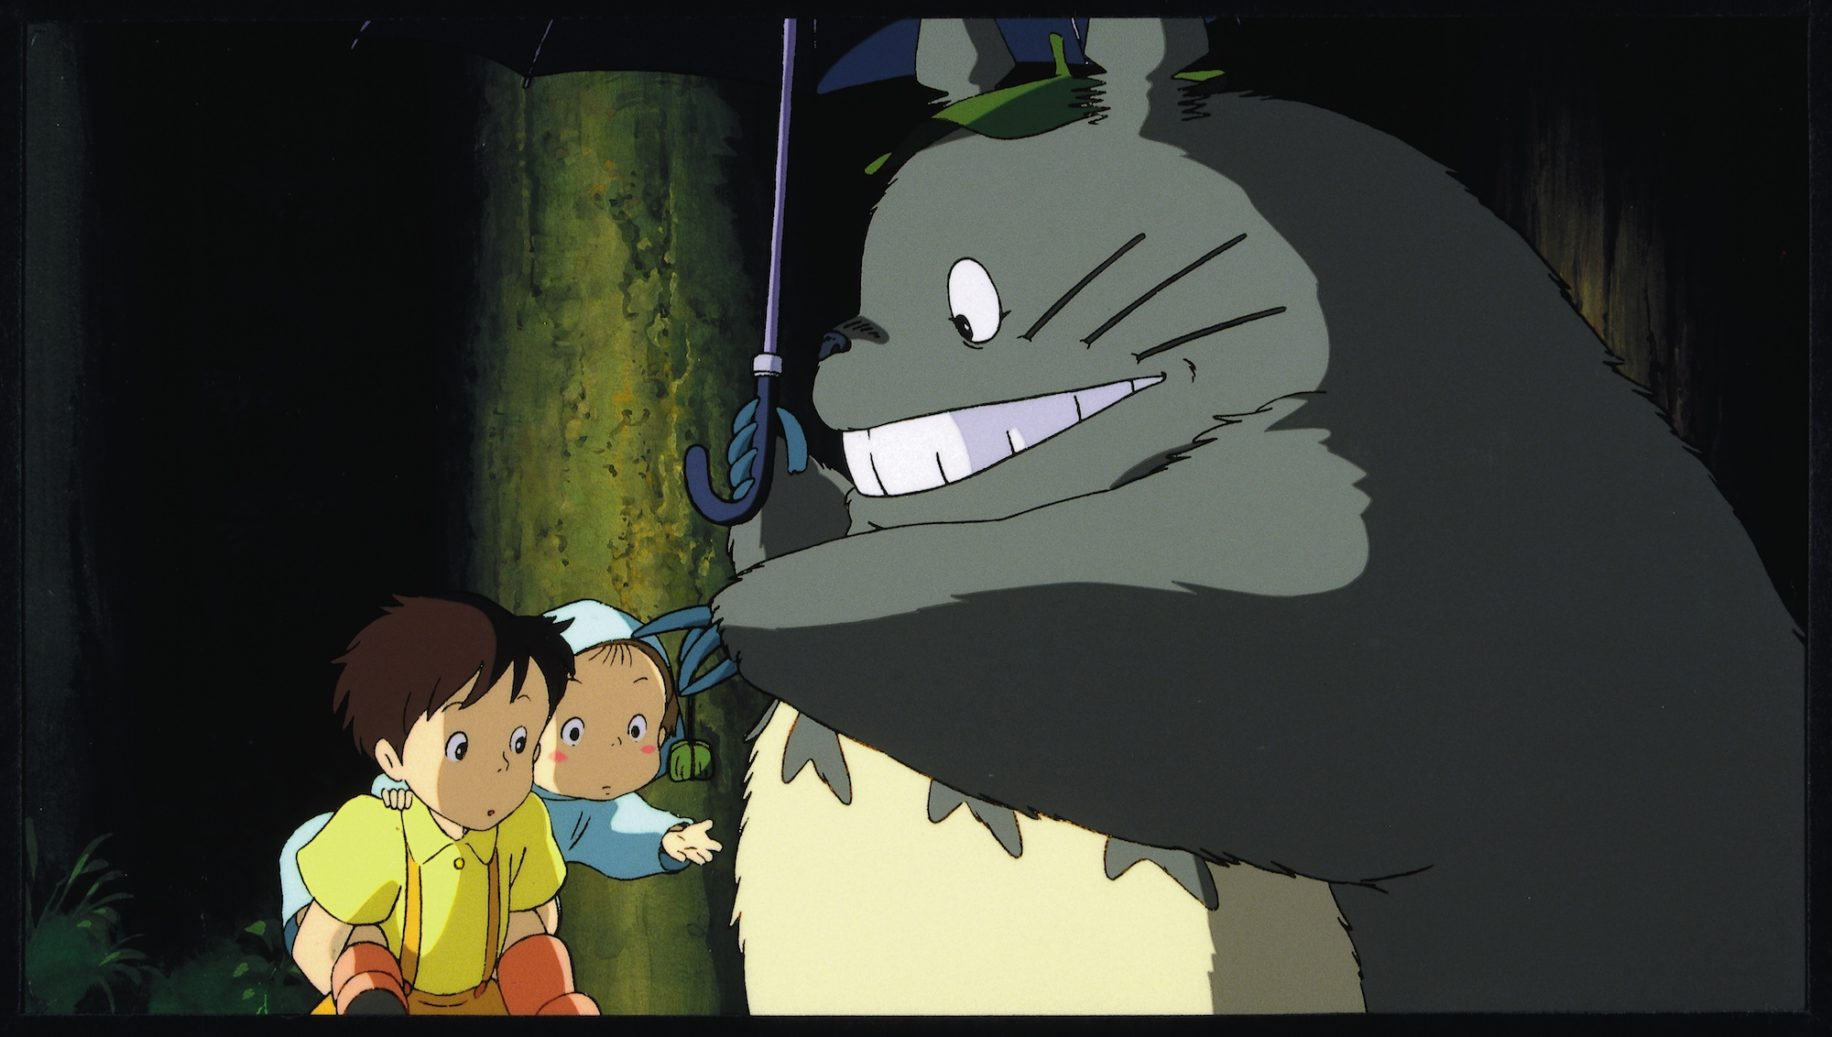 WINNERS ANNOUNCED!: Win Tickets to Studio Ghibli Fest 2017's Presentation of 'My Neighbor Totoro'